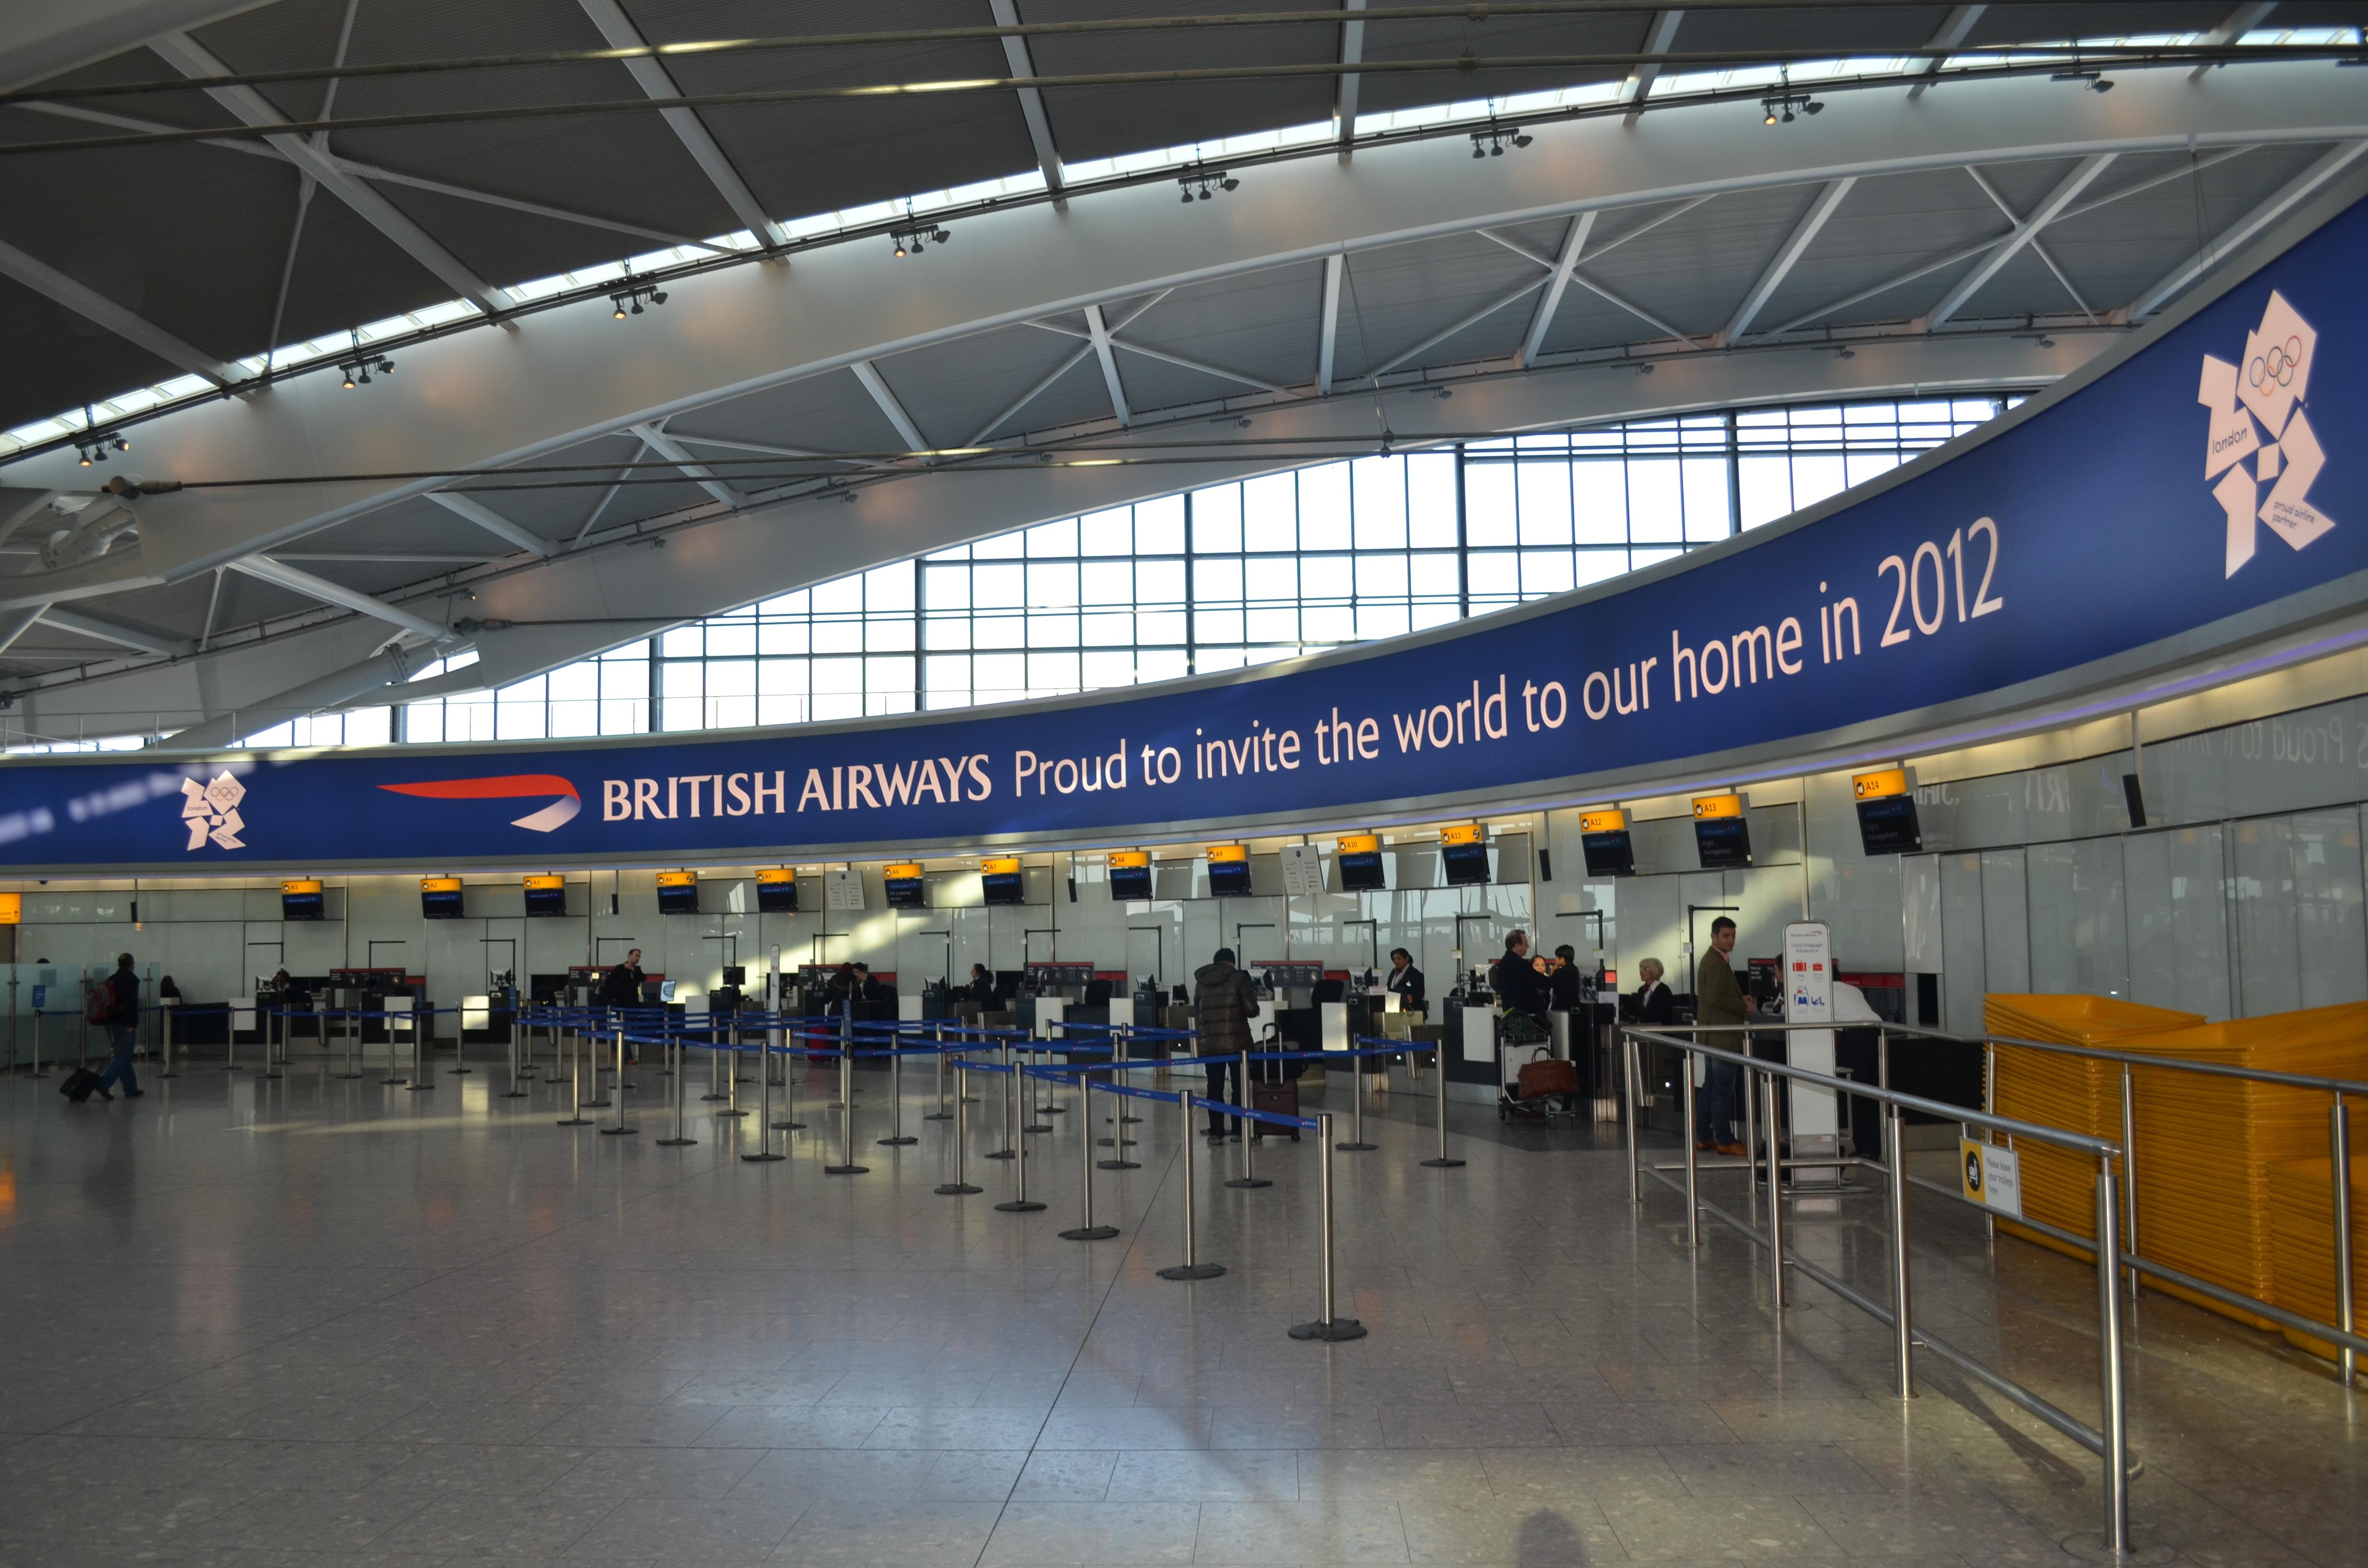 London Flughafen Hotel